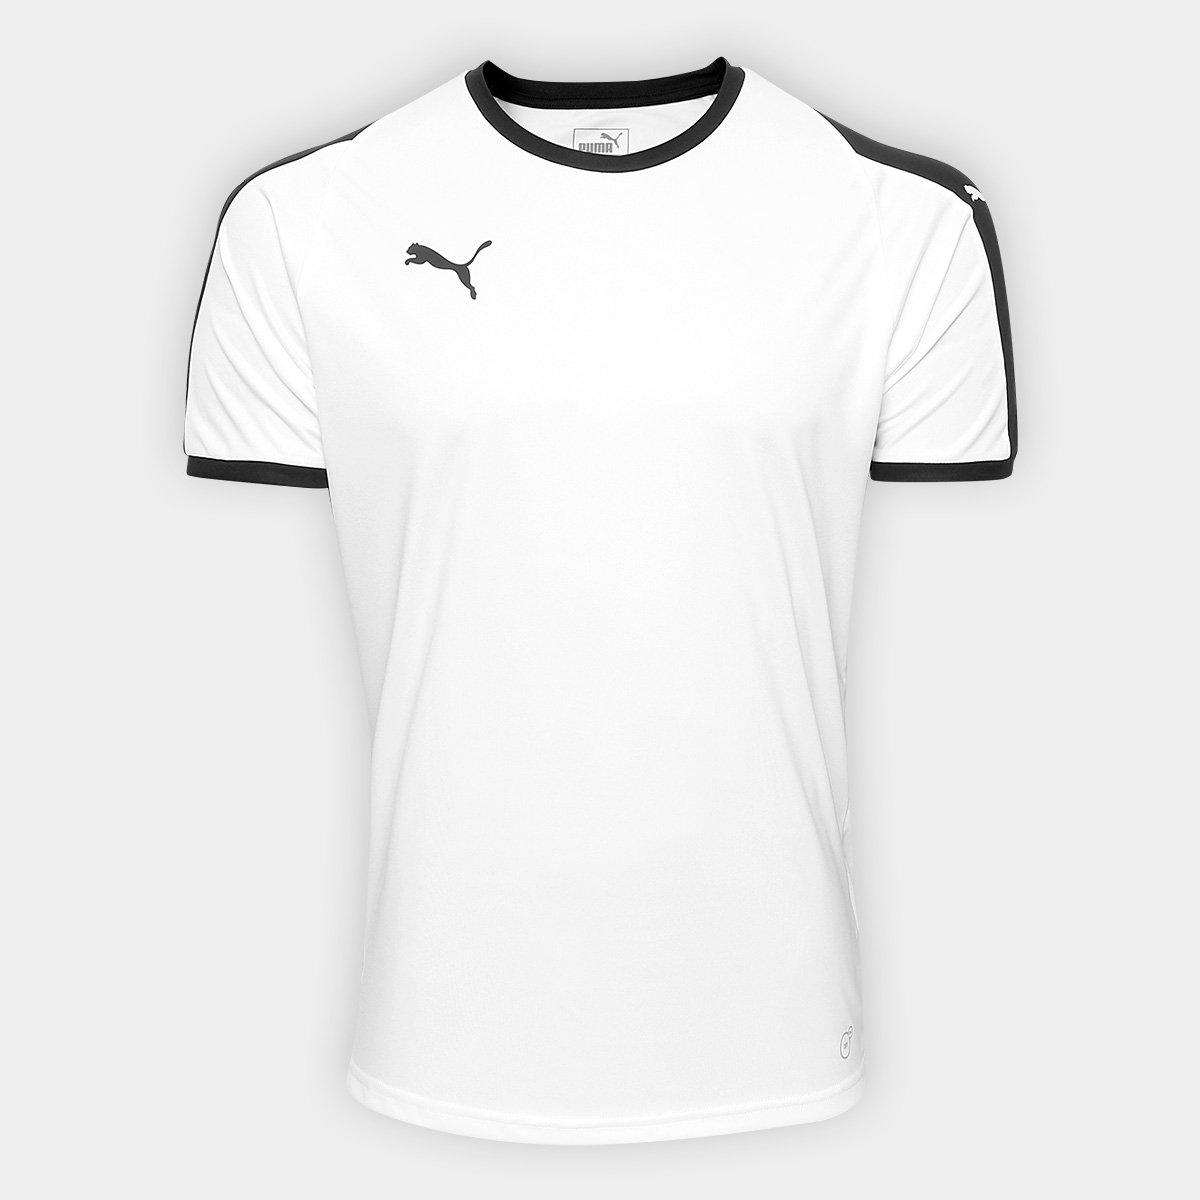 3bed7d0d22dde Camisa Puma Liga Jersey Masculina - Branco e Preto - Compre Agora ...